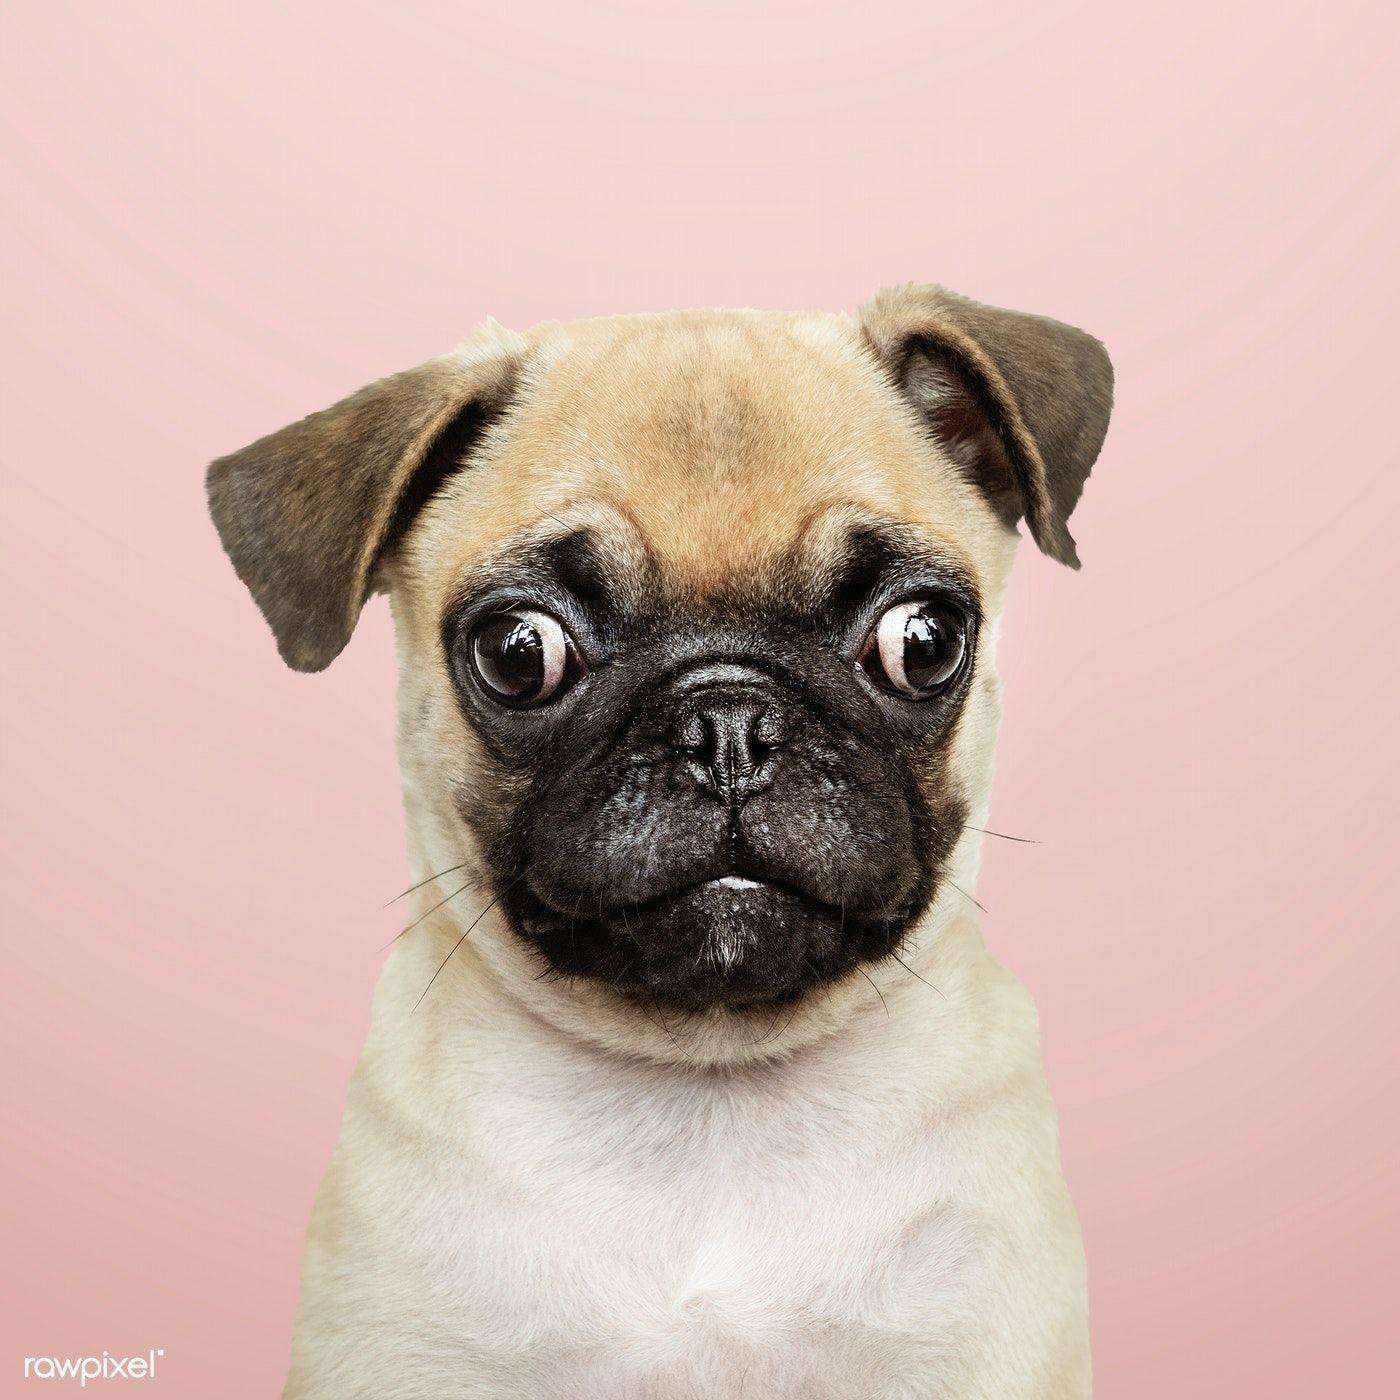 Download Premium Image Of Adorable Pug Puppy Solo Portrait 542162